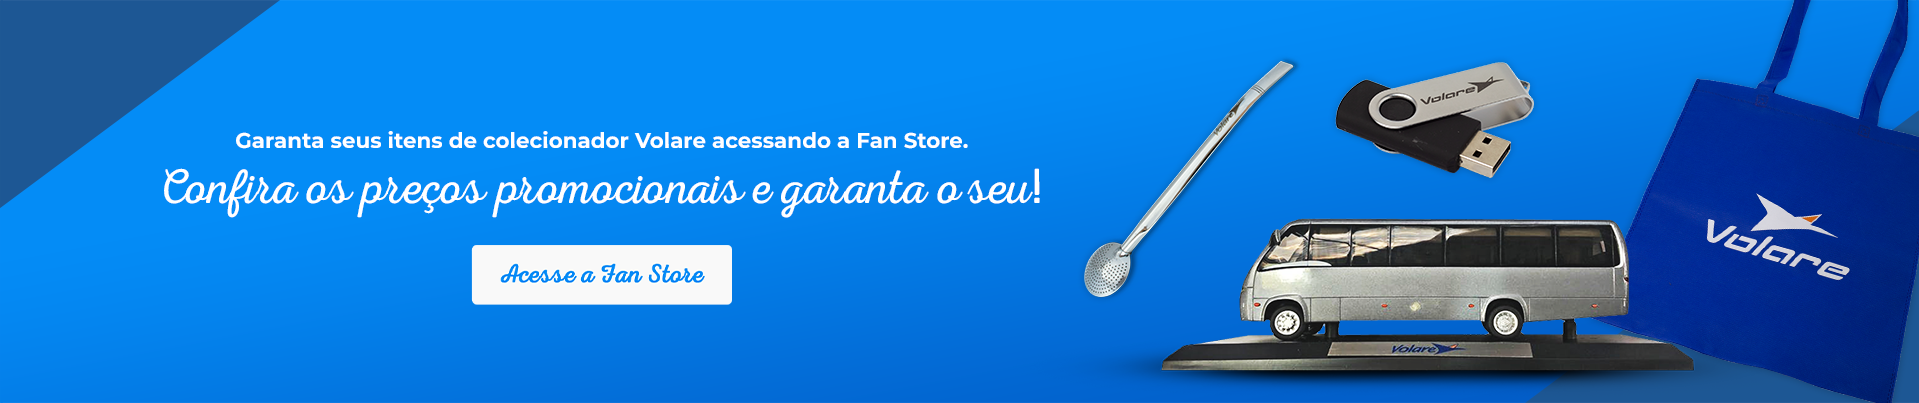 Conheça os itens de Fan Store Volare!